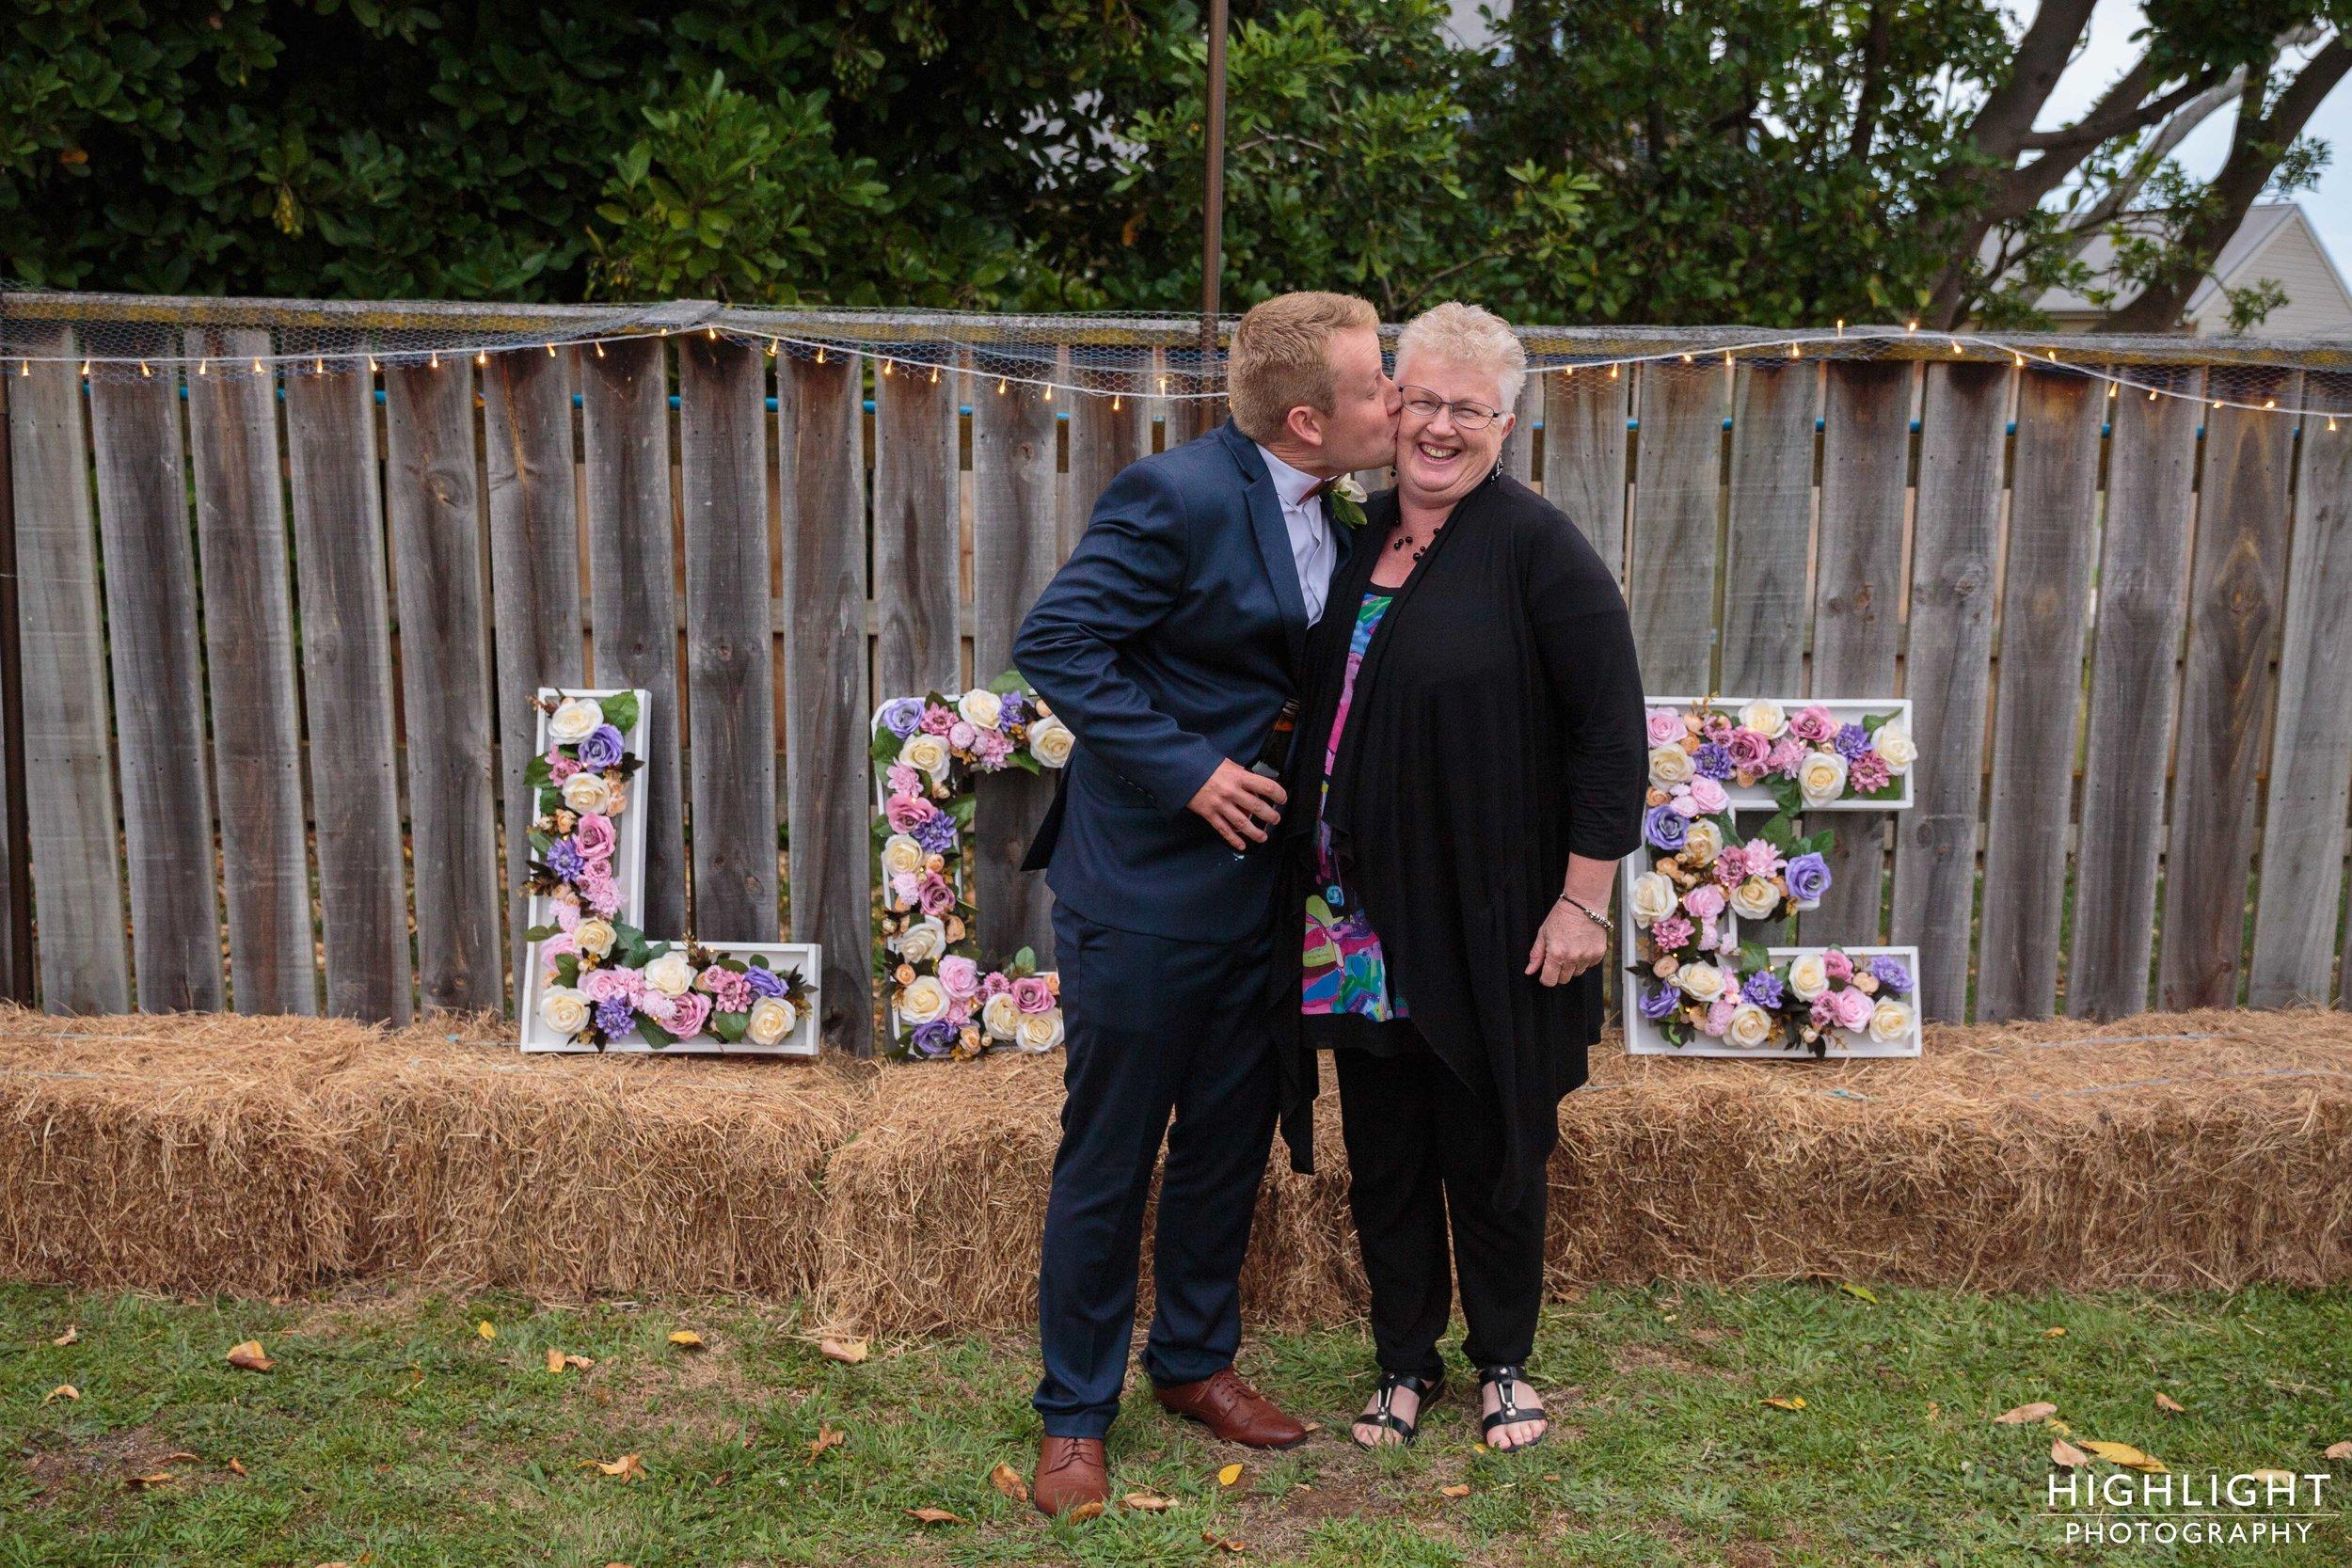 JM-2017-Highlight-wedding-photography-palmerston-north-new-zealand-234.jpg